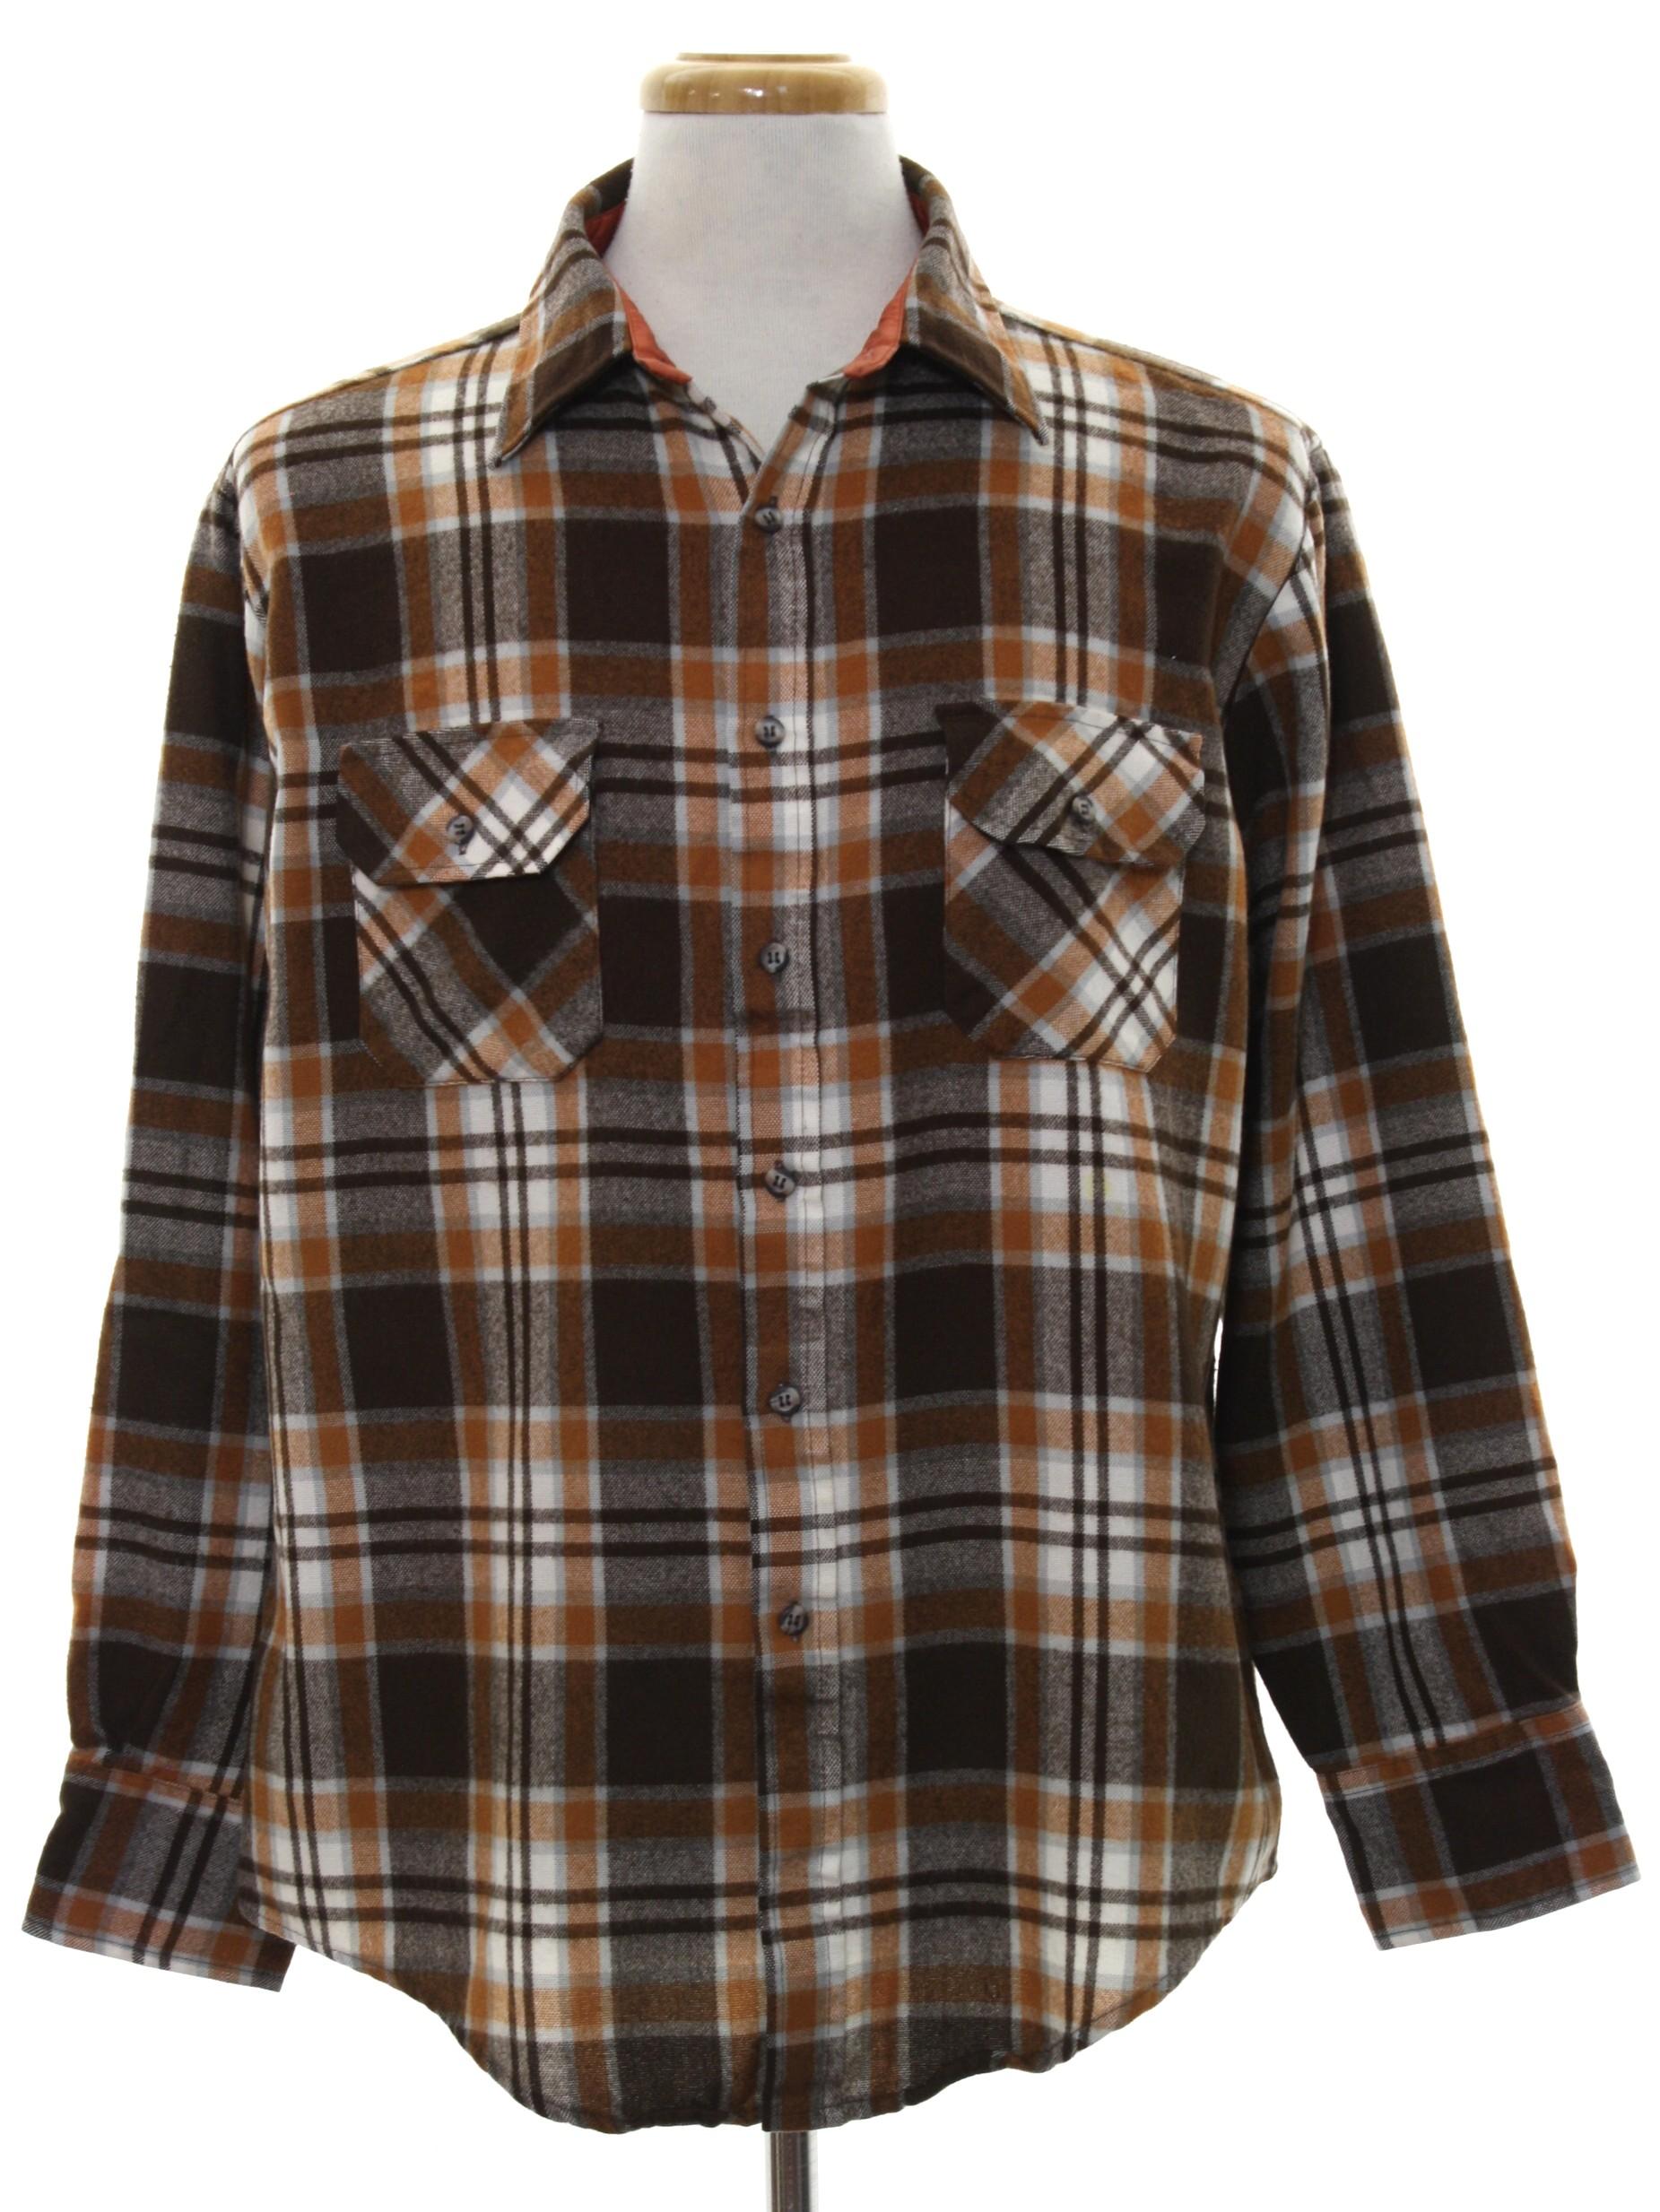 8e1371f65b53 Vintage Northwest Territory 80 s Shirt  80s -Northwest Territory ...